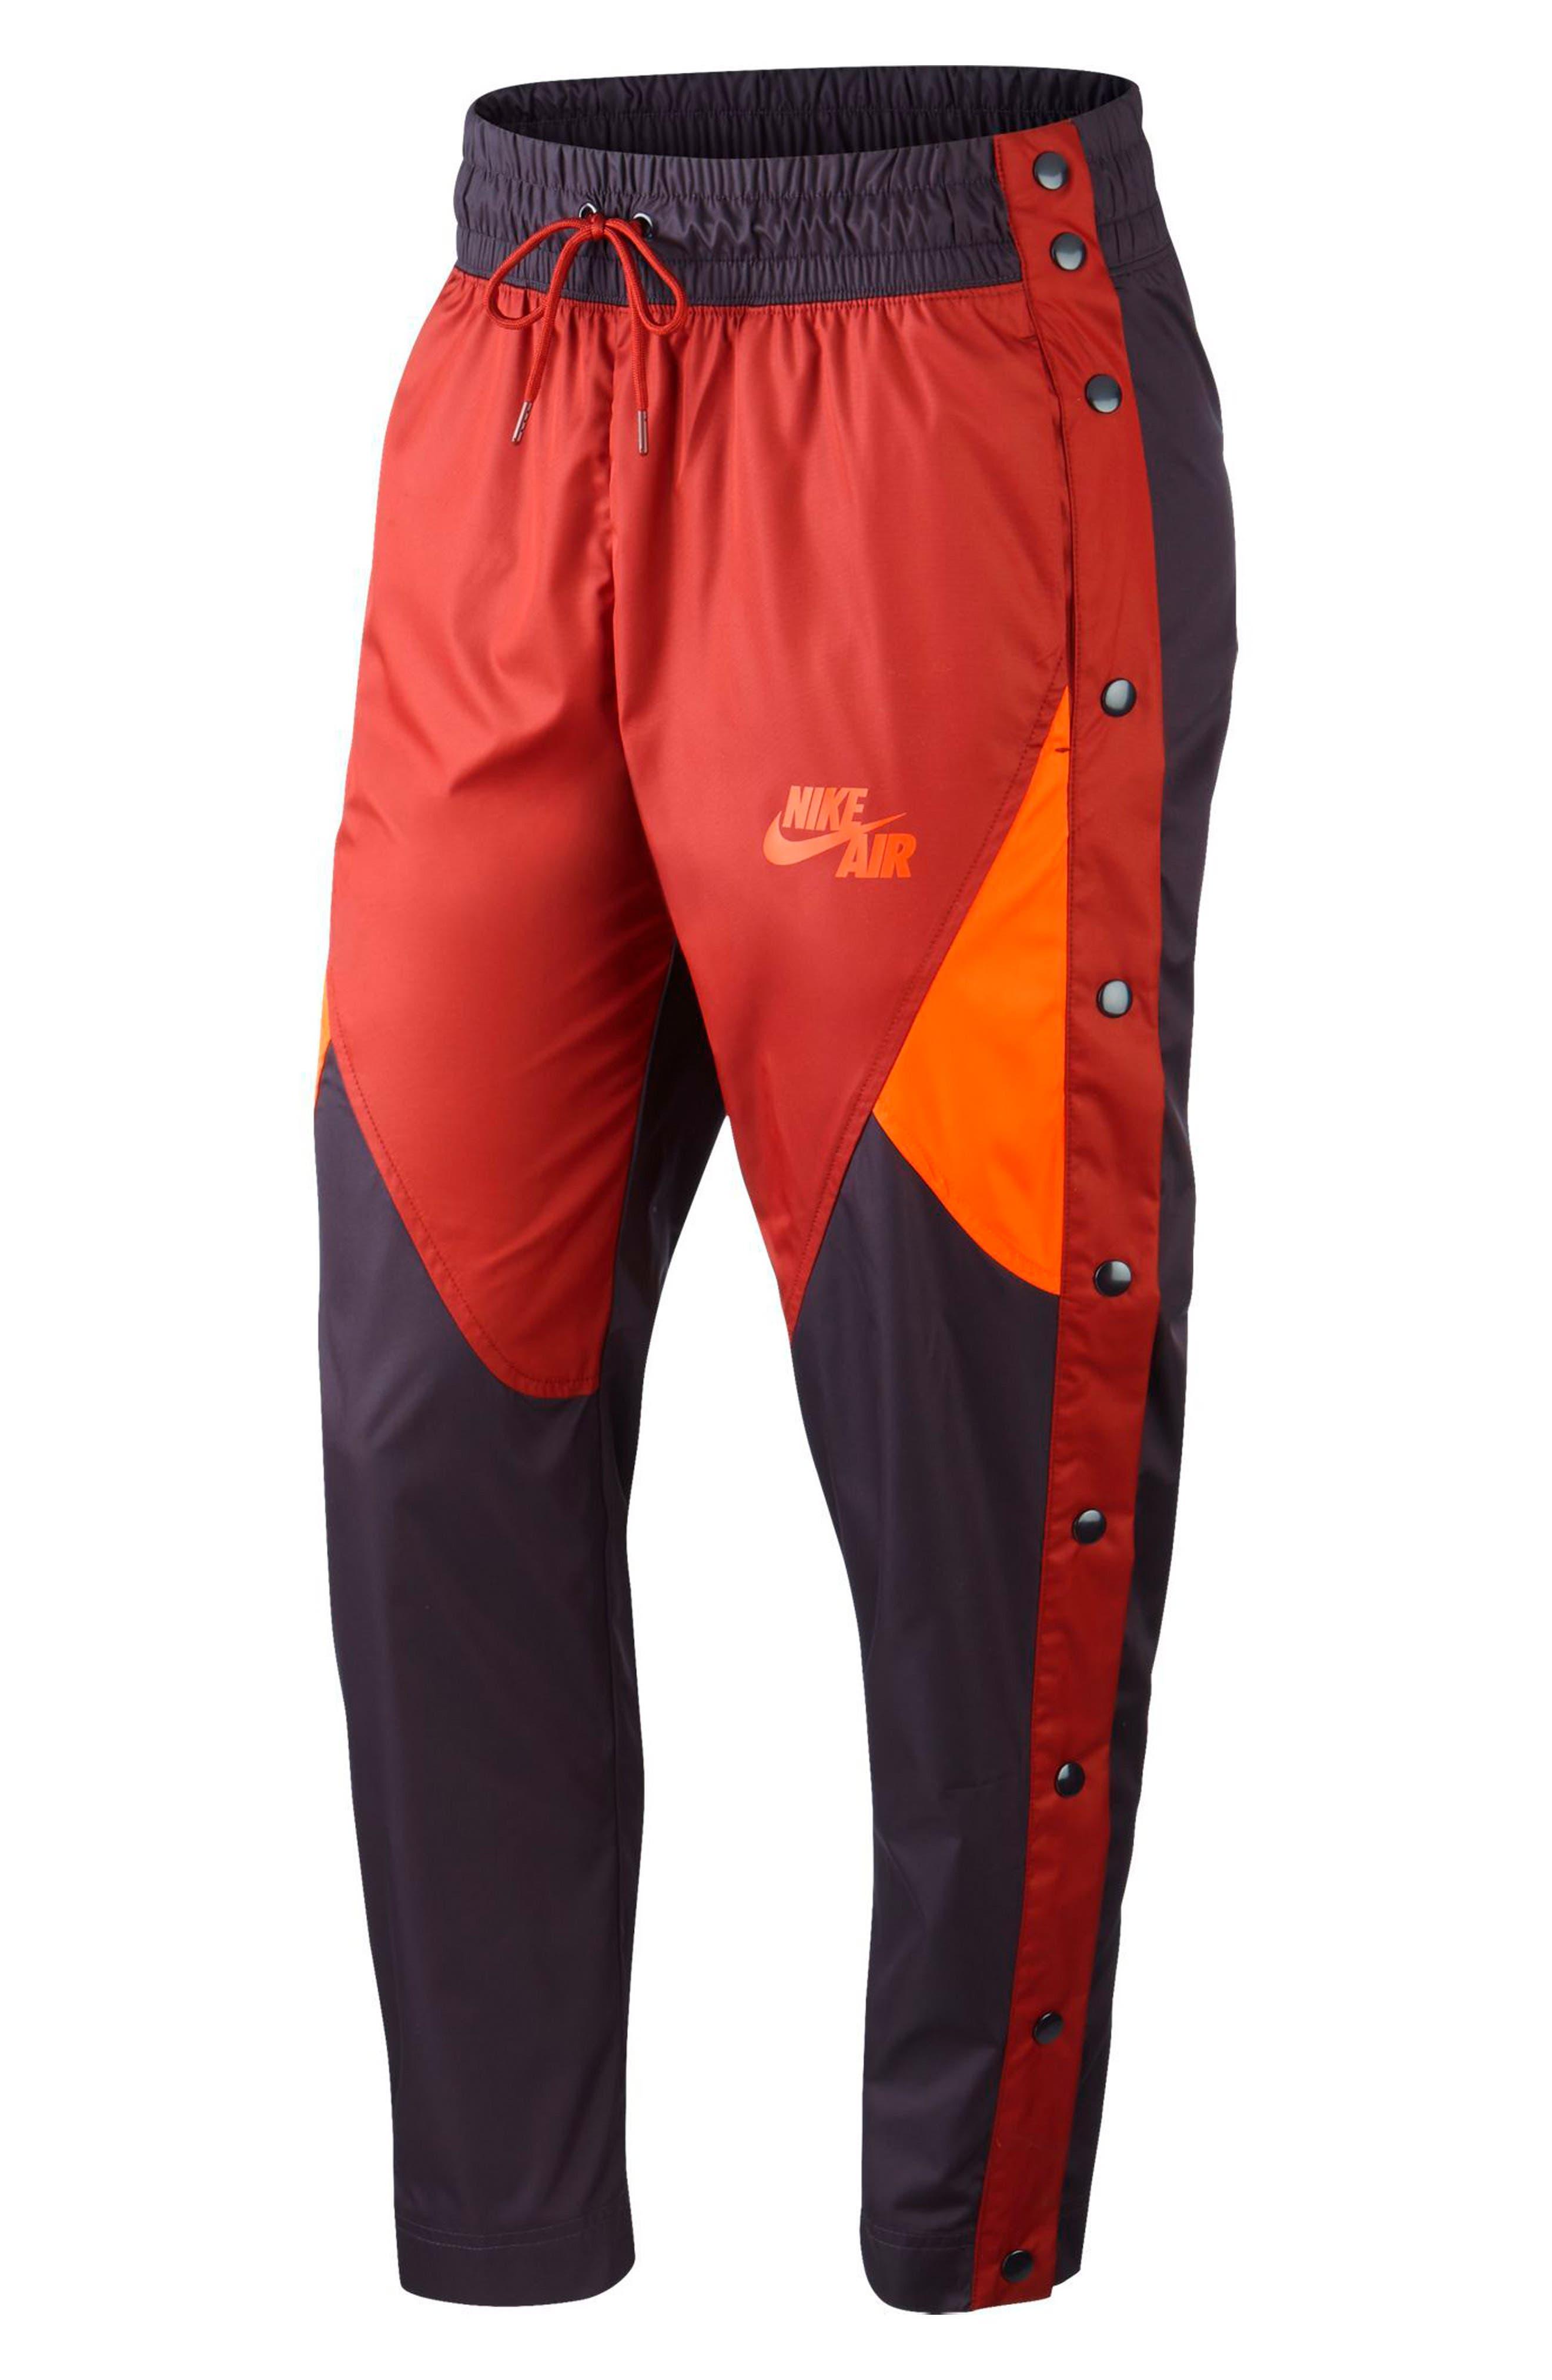 Sportswear Tearaway Woven Pants,                             Main thumbnail 2, color,